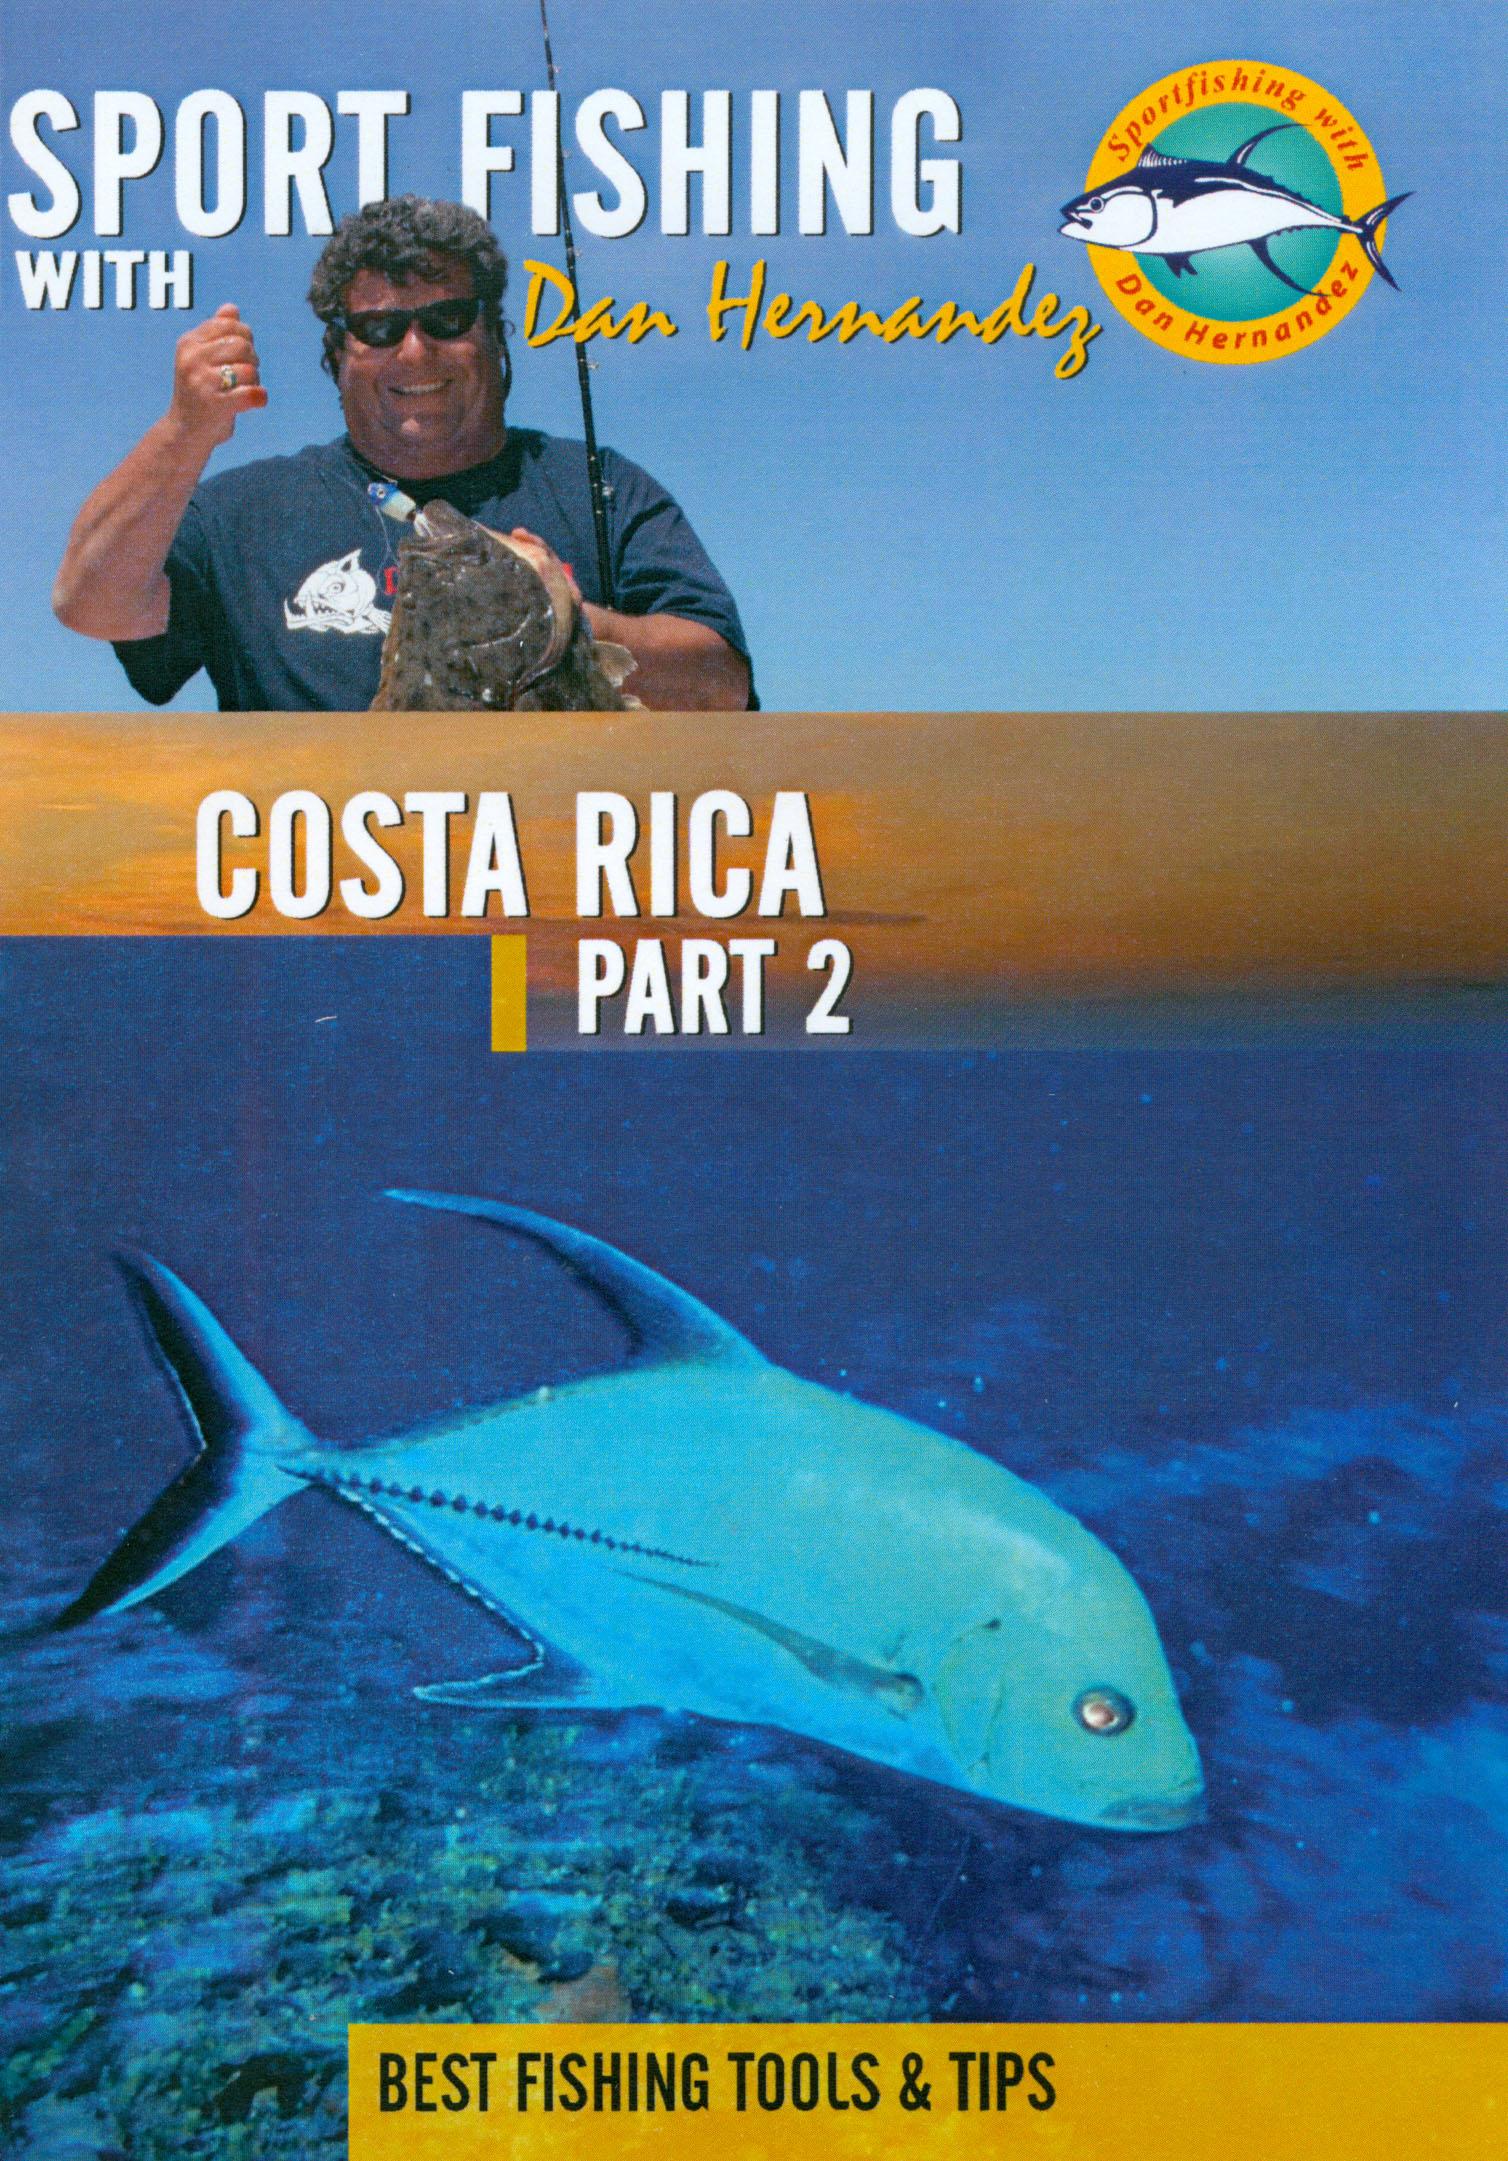 Sport Fishing With Dan Hernandez: Costa Rica, Part 2